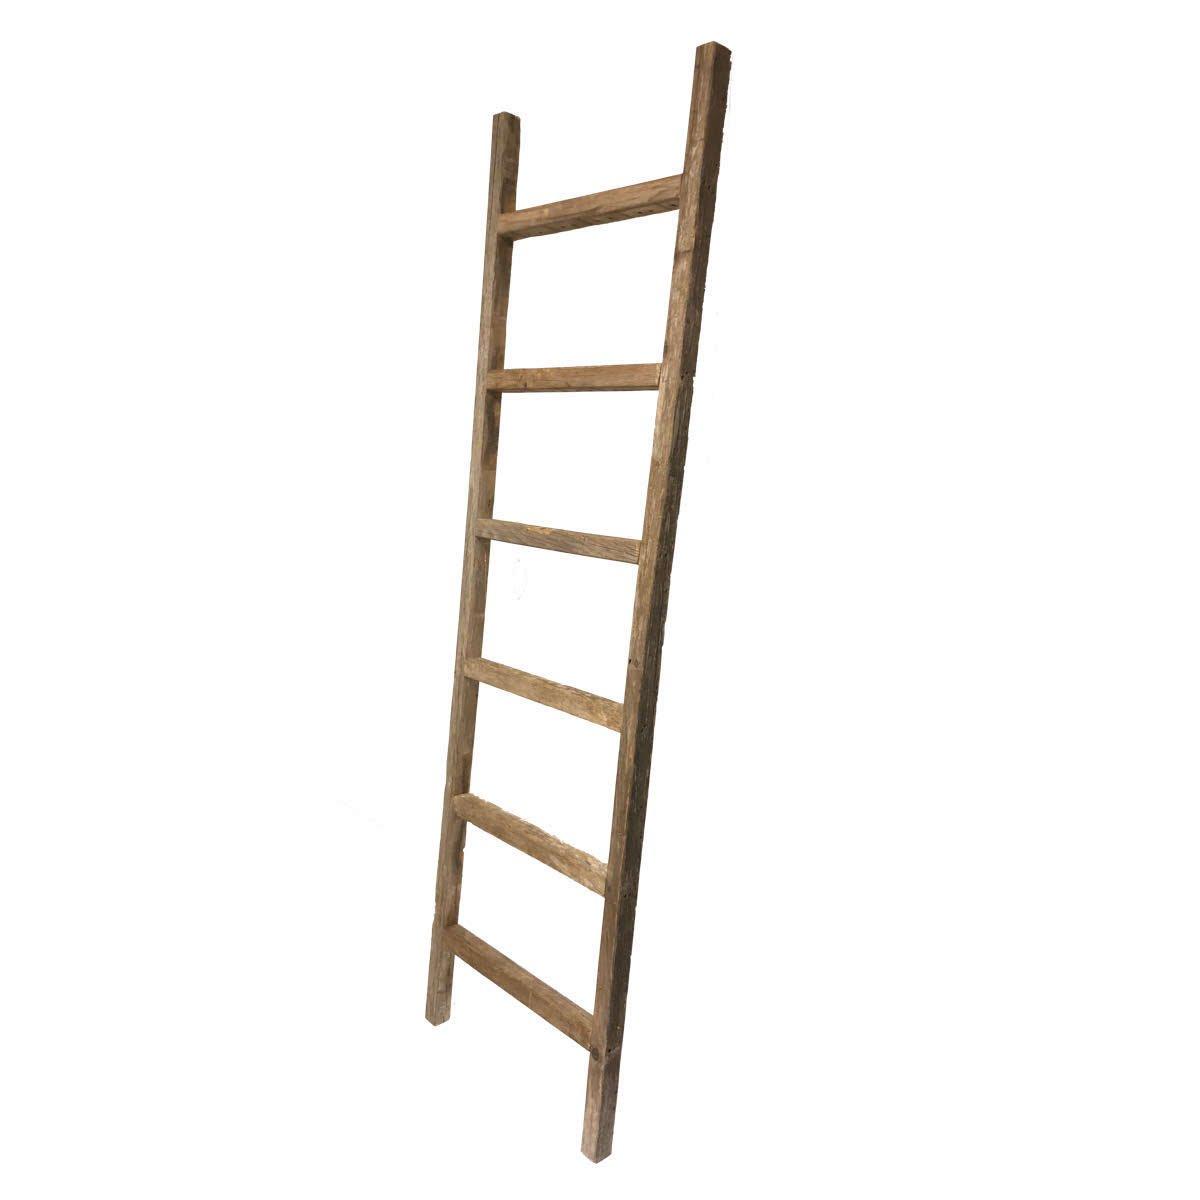 BarnwoodUSA Rustic 6 ft Wide Decorative Ladder - 100% Reclaimed Wood Ladder, Weathered Gray ♻️ by BarnwoodUSA